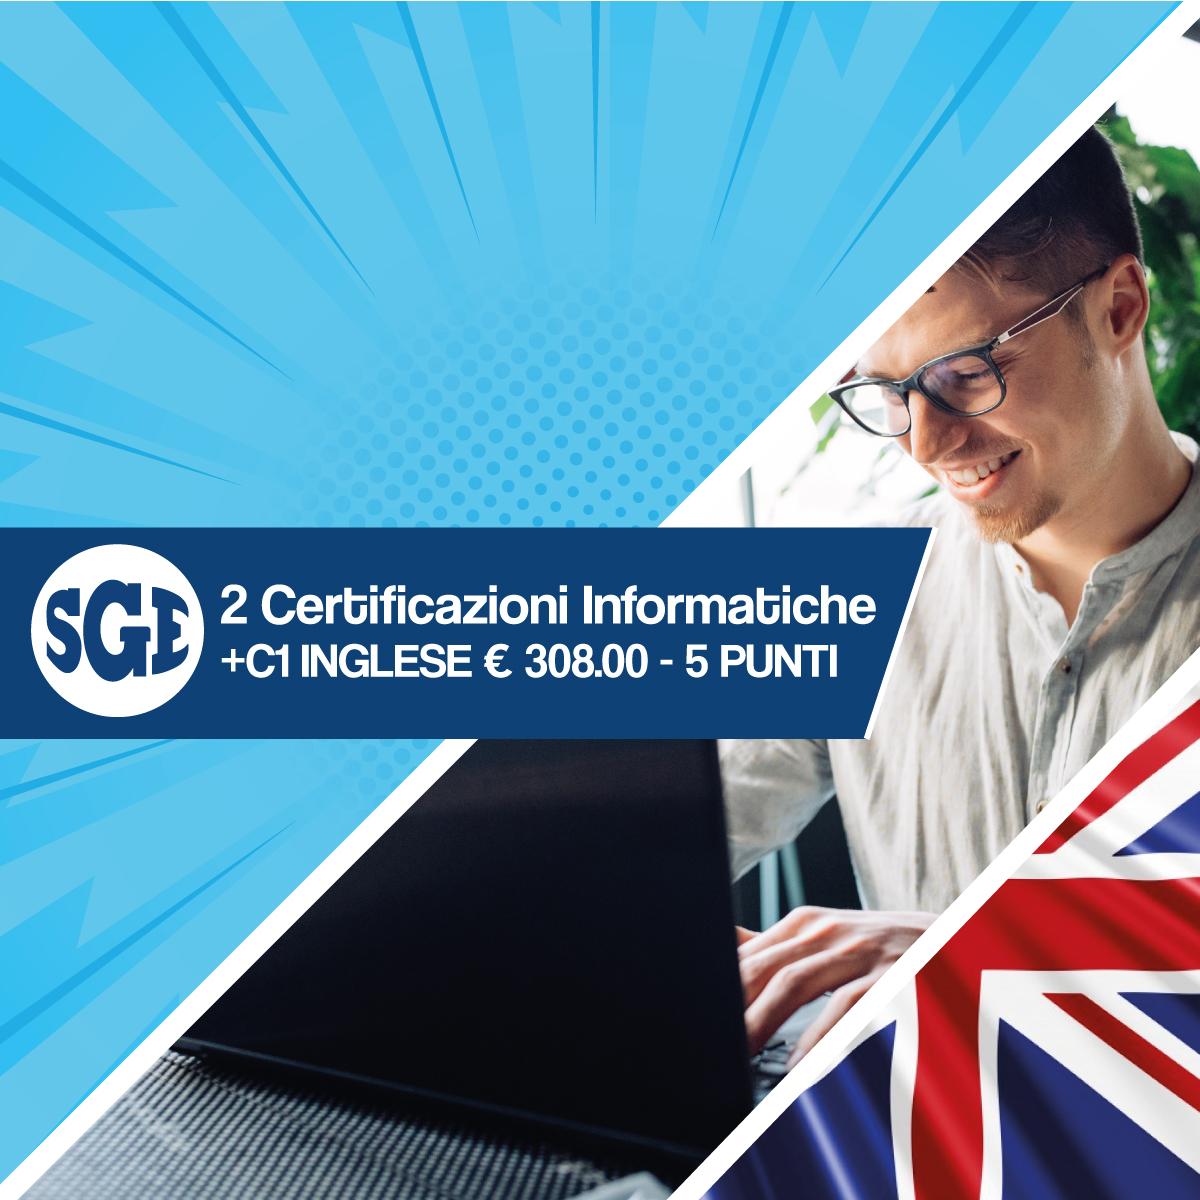 4 Certificazioni Informatiche +C1 INGLESE €459.00 - 6 PUNTI